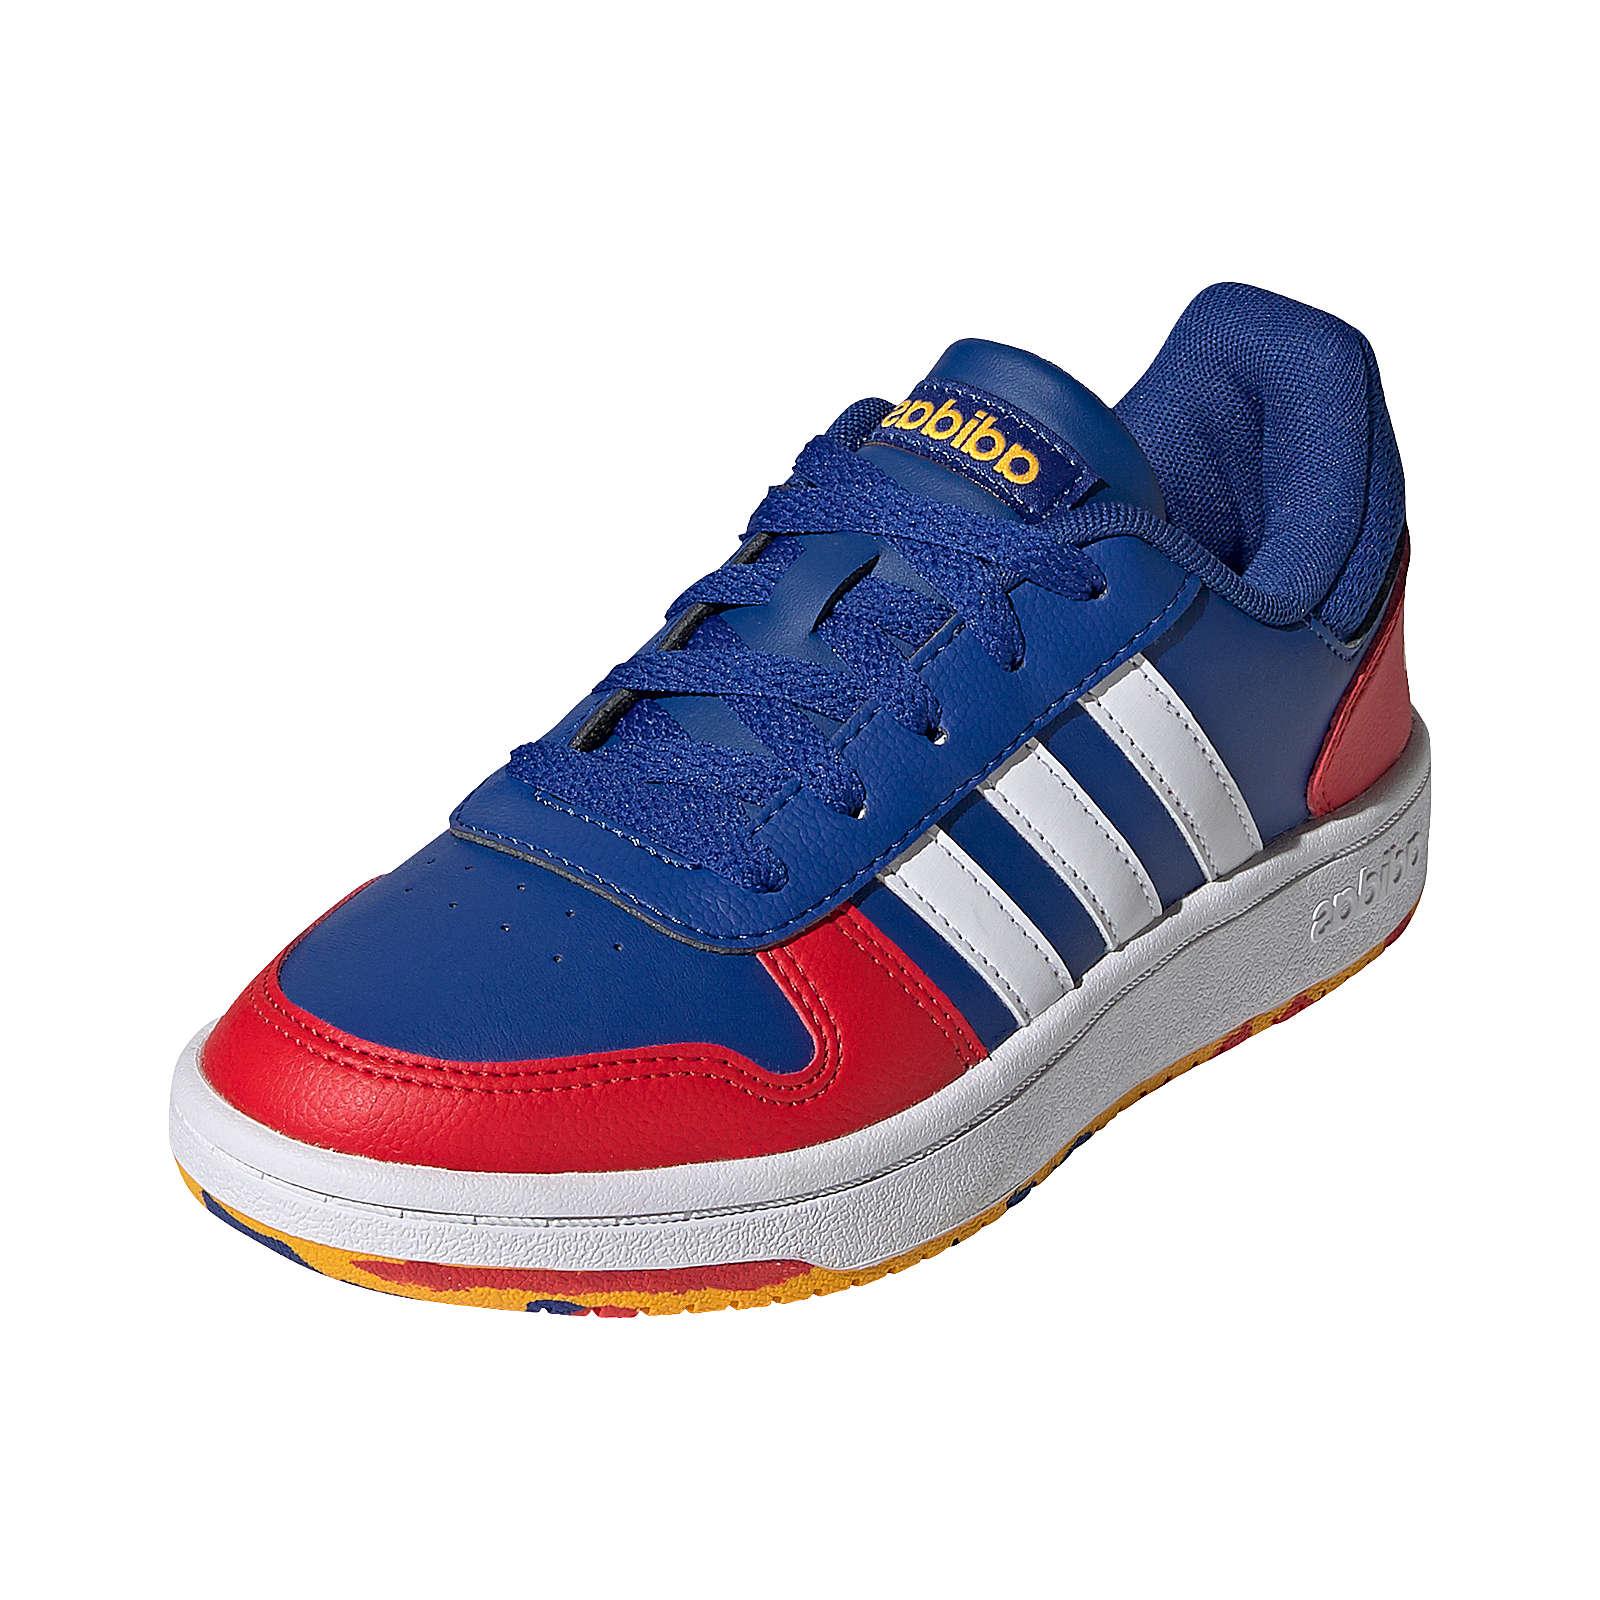 adidas Sneakers Low HOOPS 2.0 für Jungen blau/weiß Junge Gr. 34